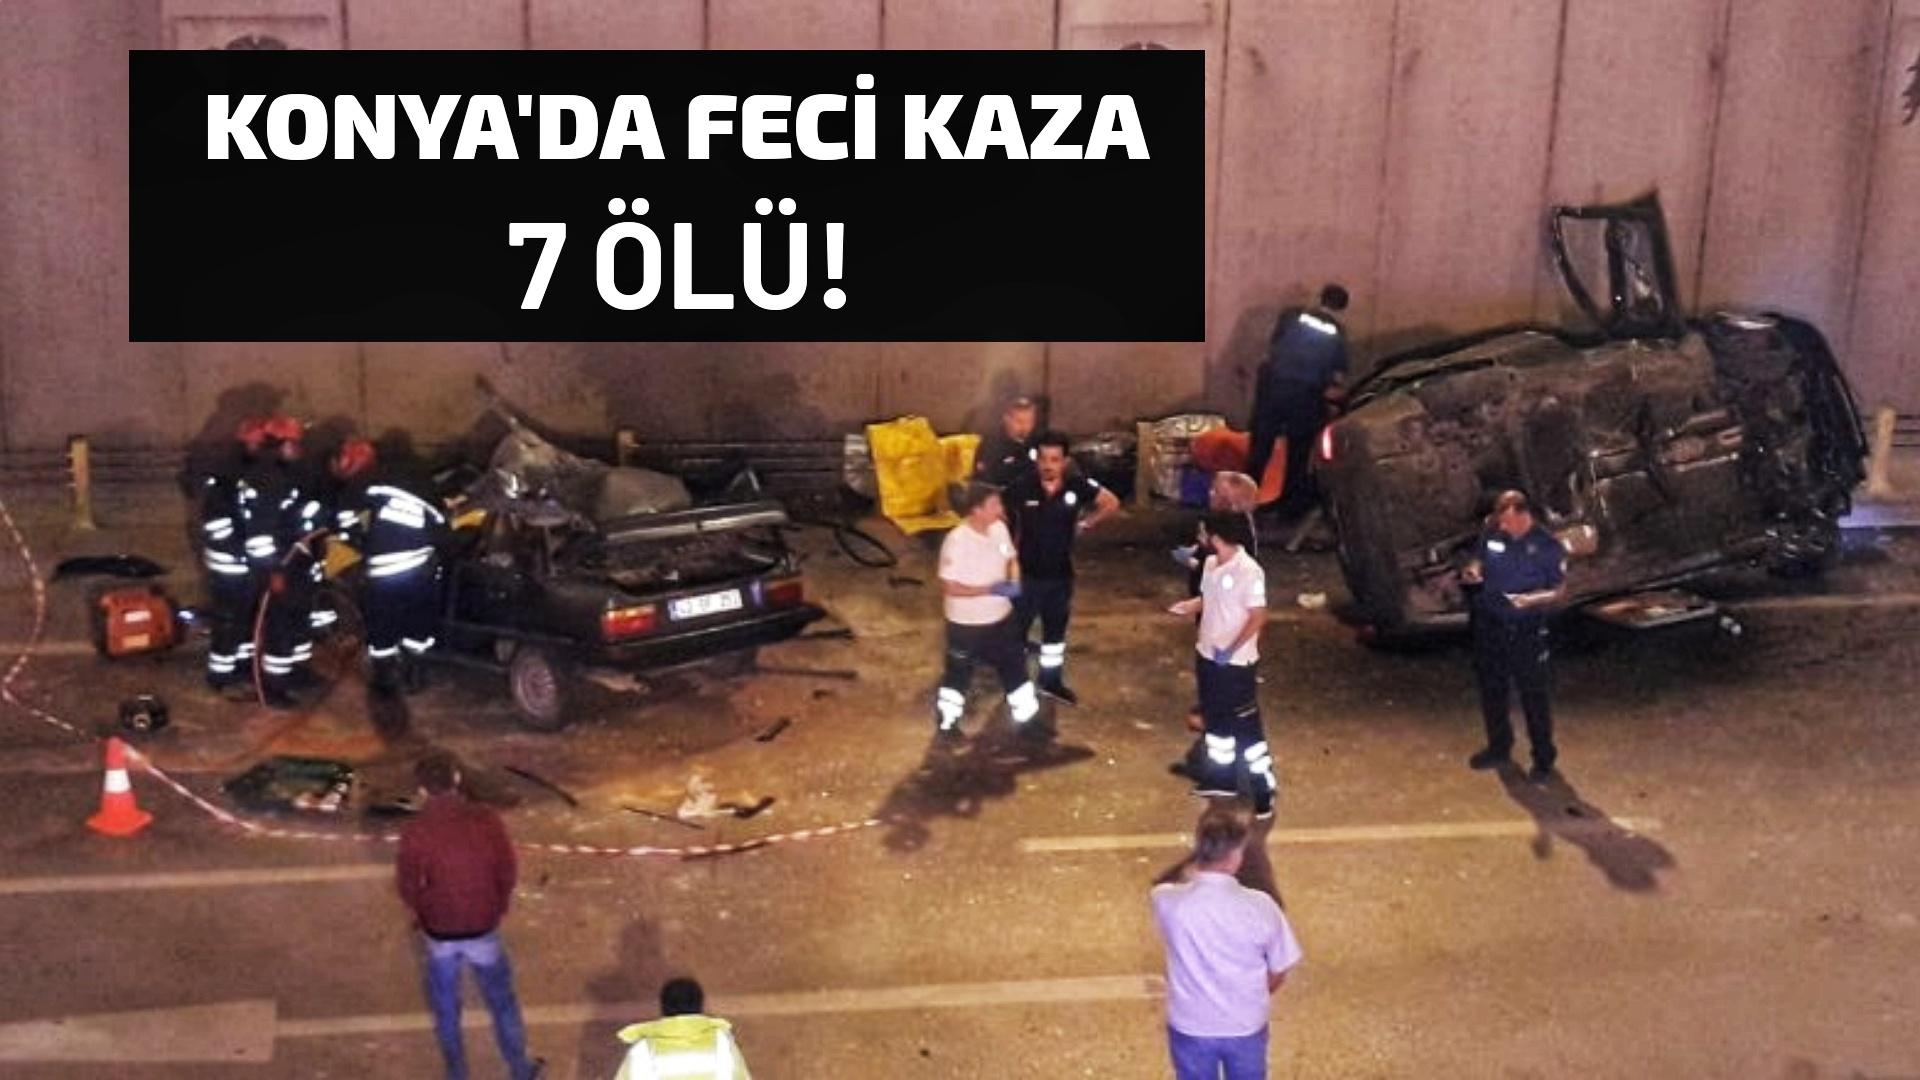 Konya'da feci kaza: 7 ölü